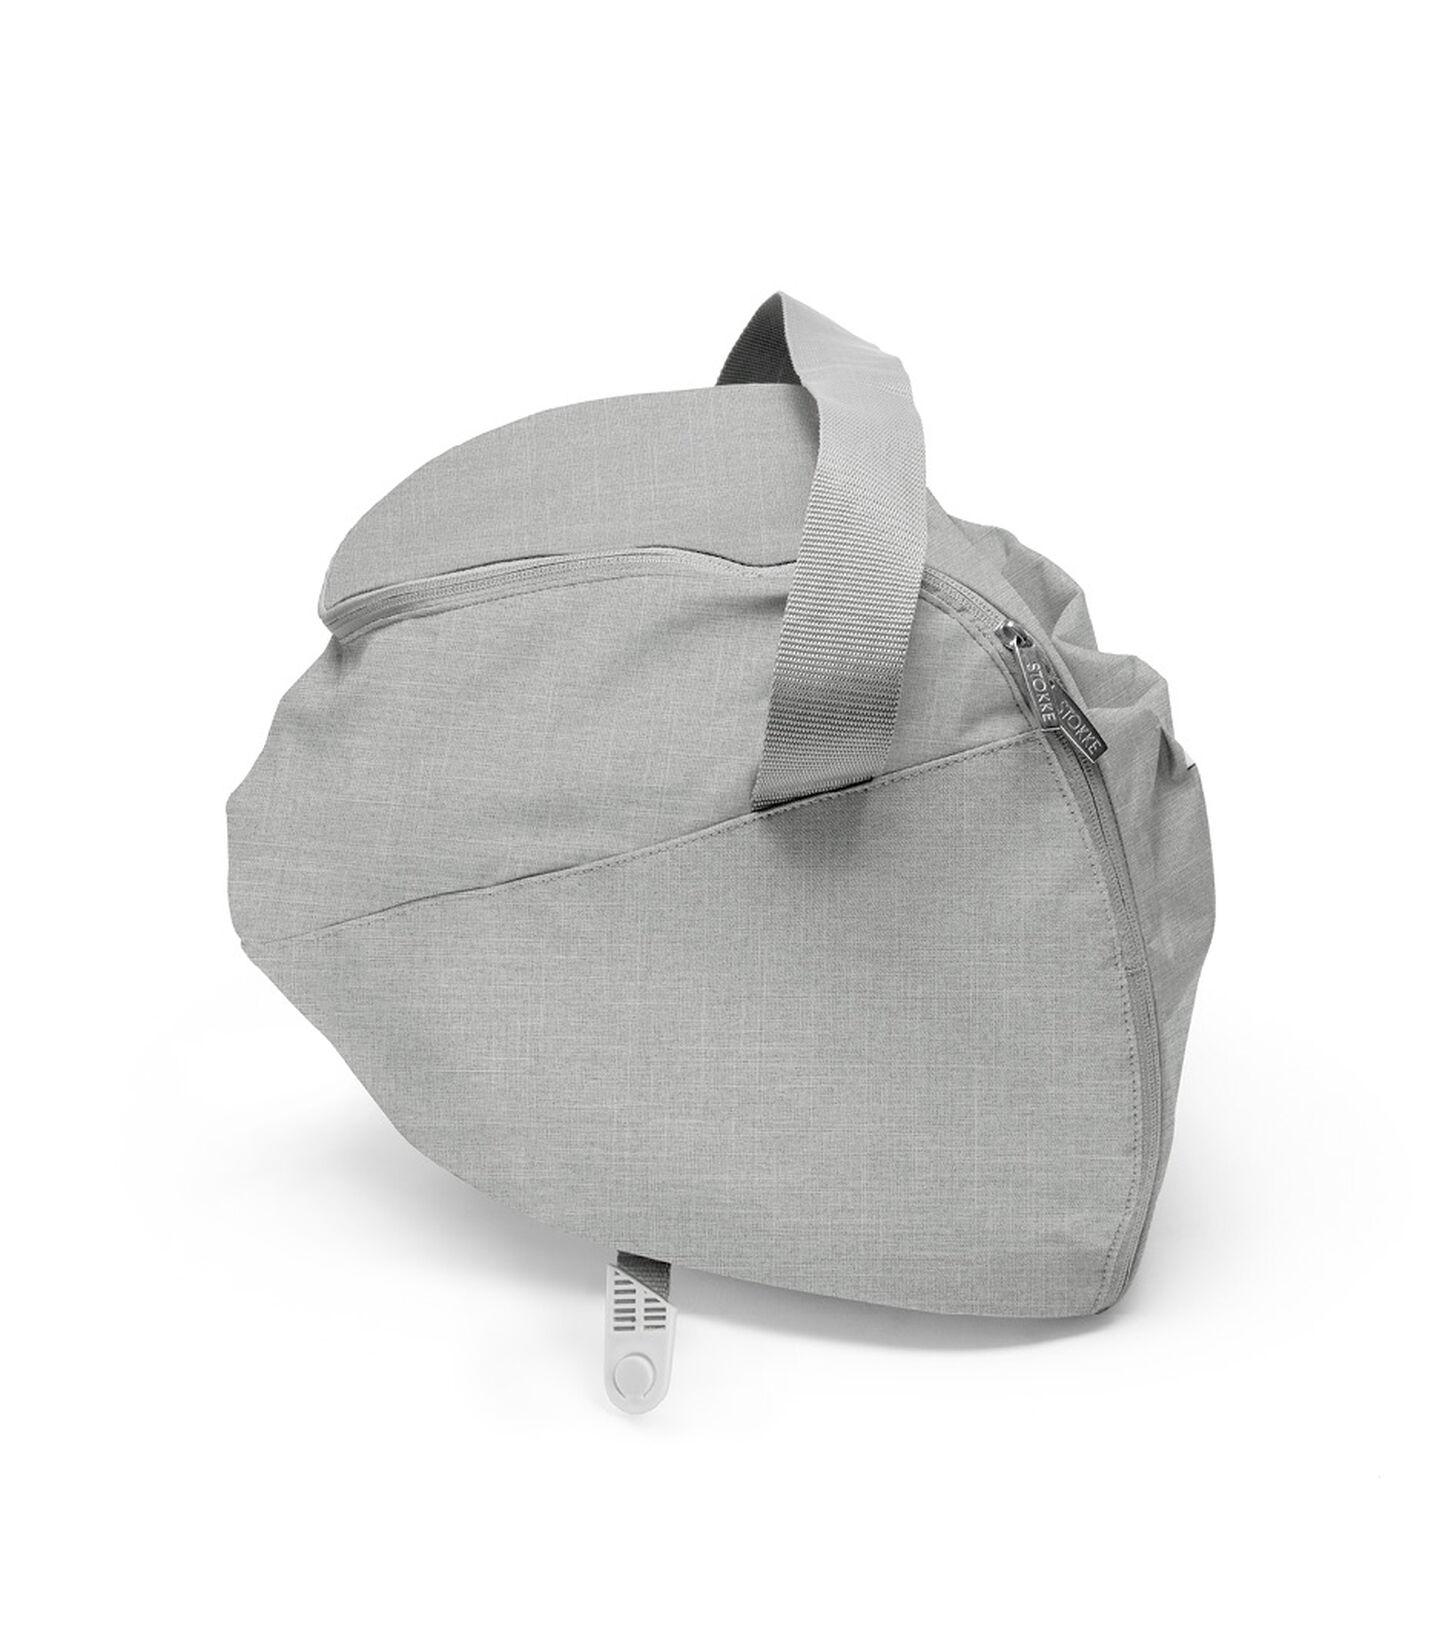 Stokke® Xplory® Shopping Bag Grey Mel, Grey Melange, mainview view 2